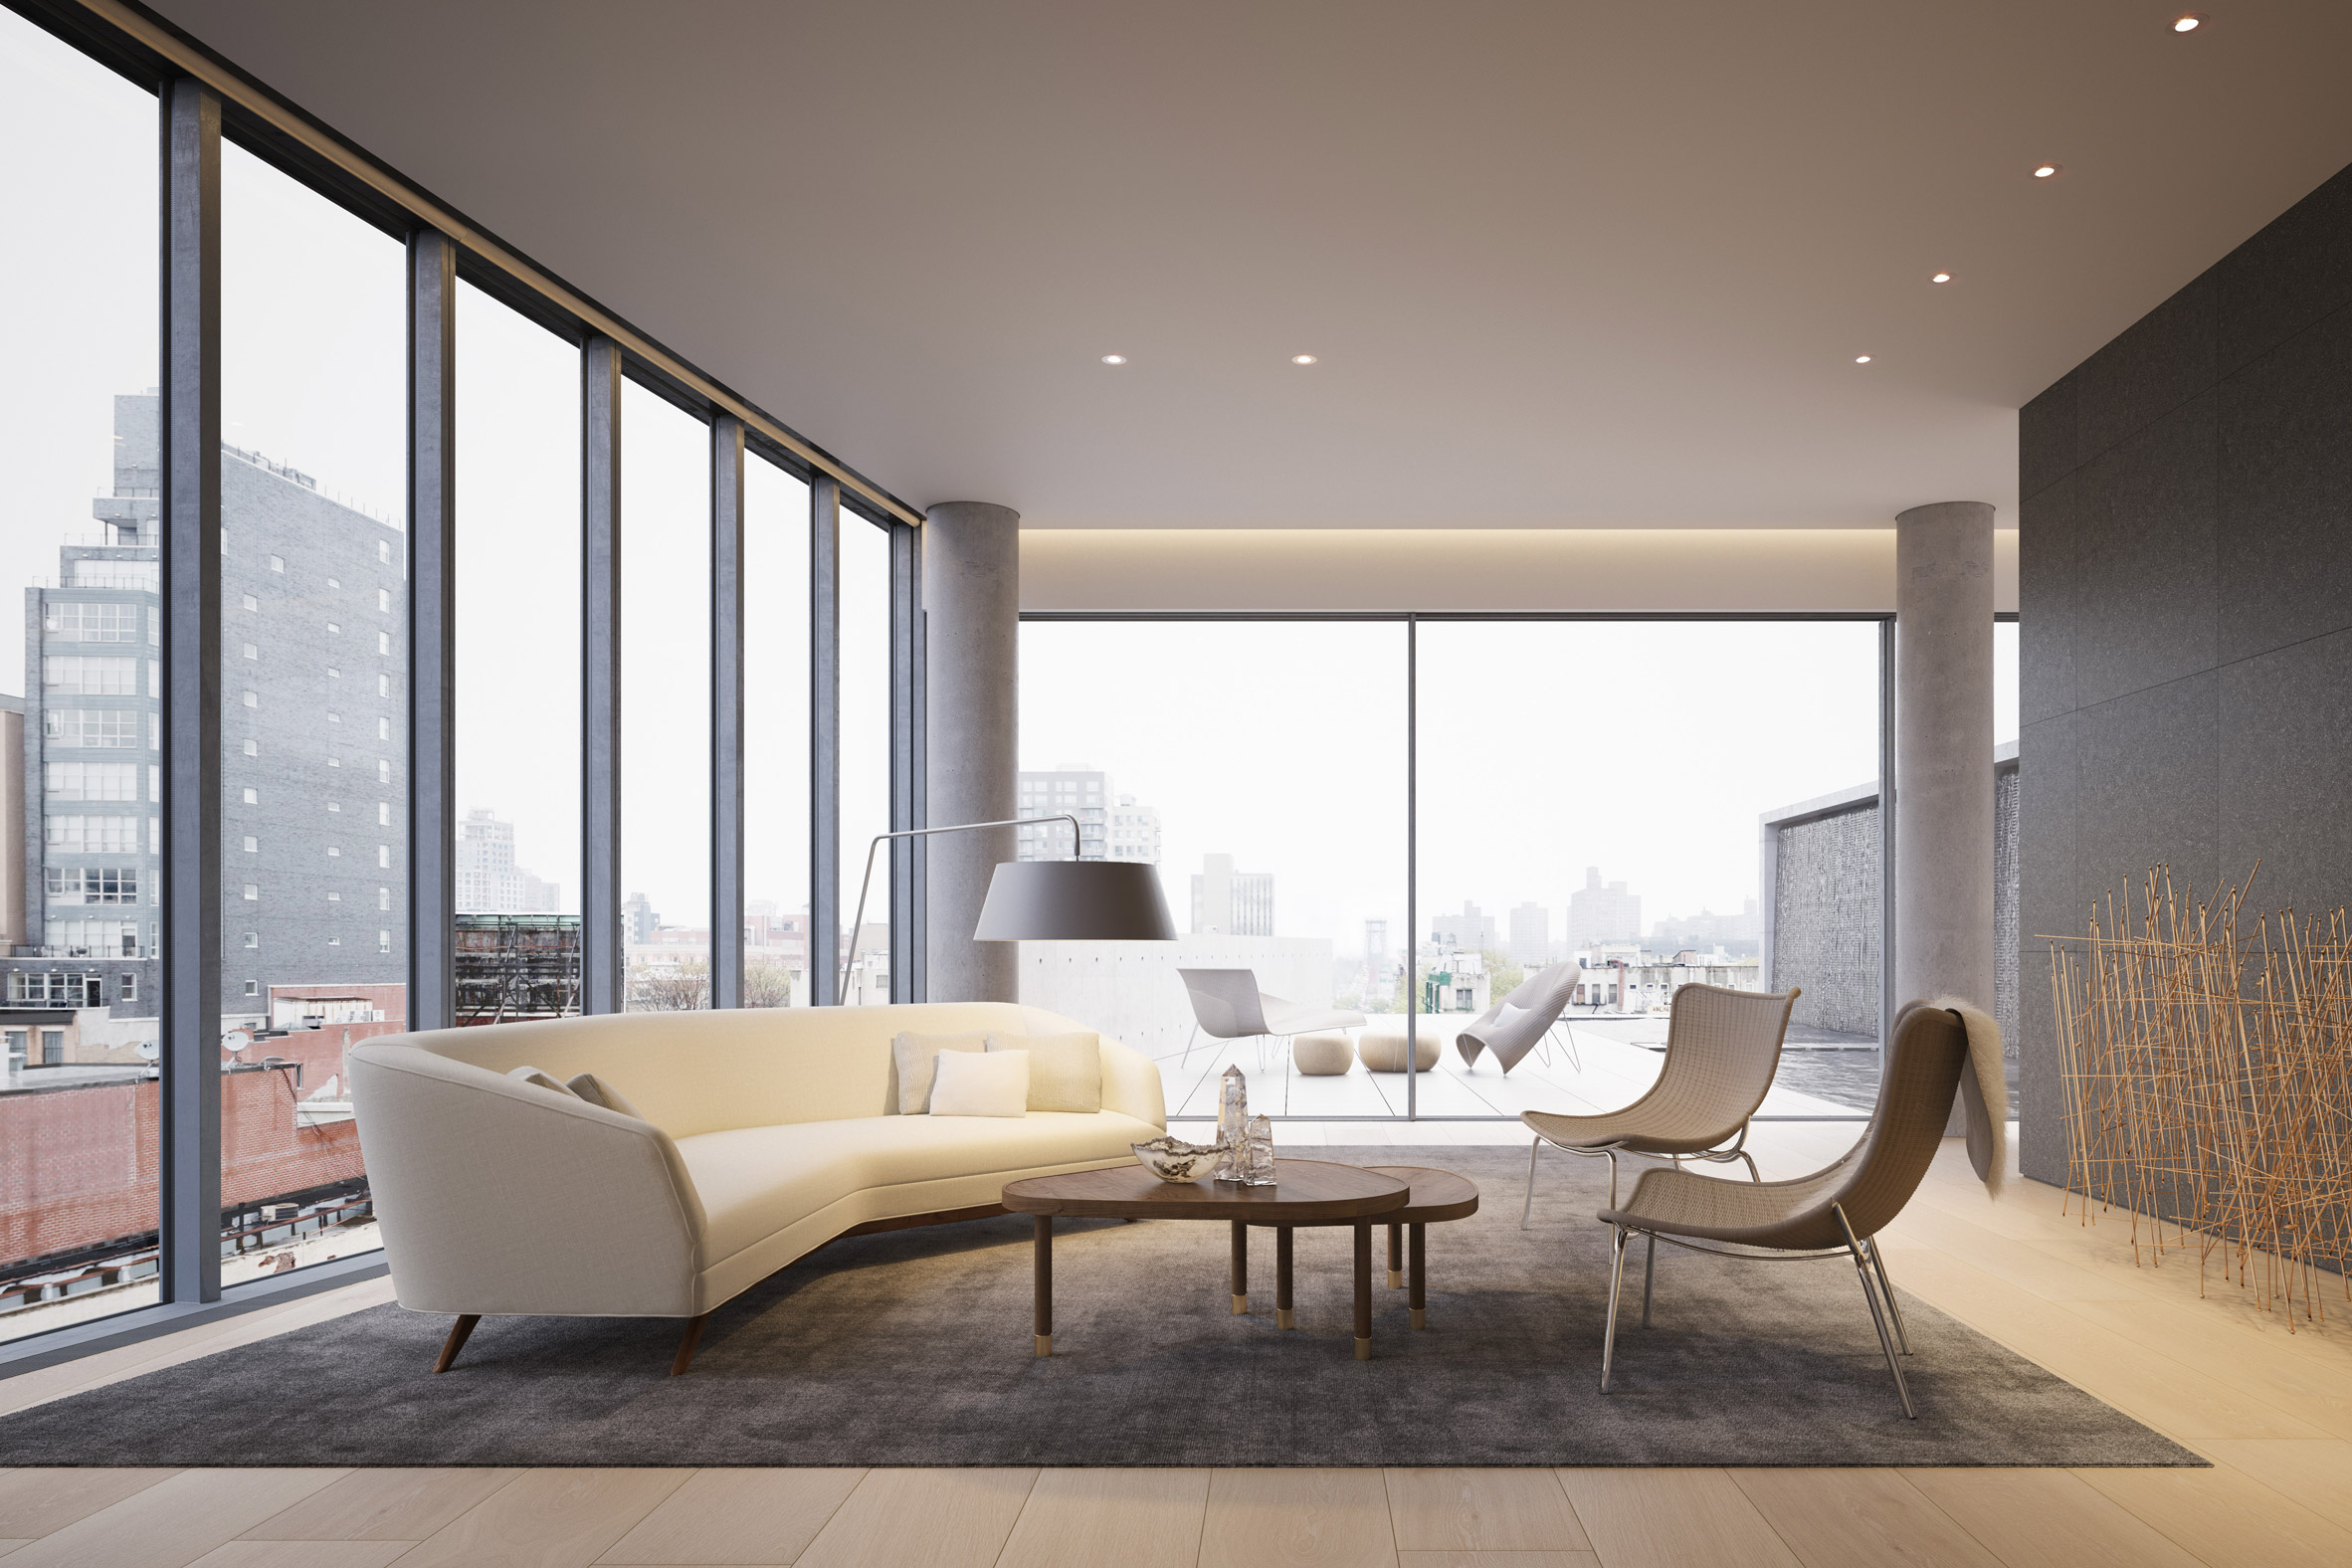 Thiết kế nội thất căn hộ Duplex 3